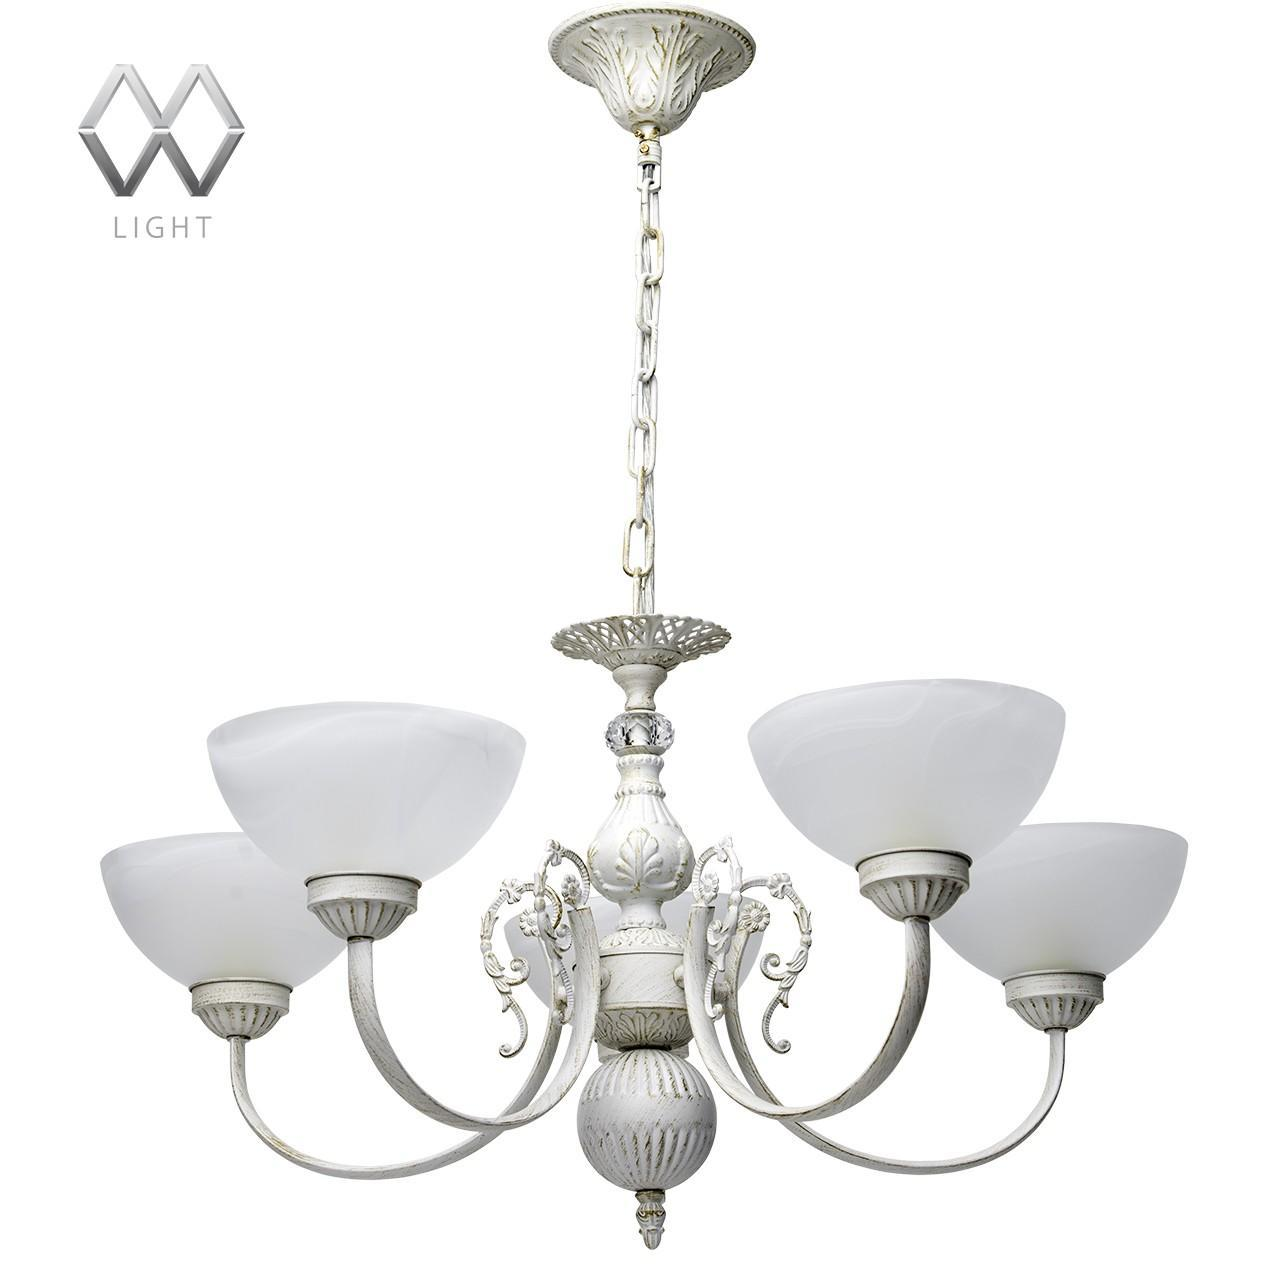 Люстра MW-Light Олимп 5 318013905 подвесная mw light подвесная люстра mw light олимп 2 318011205